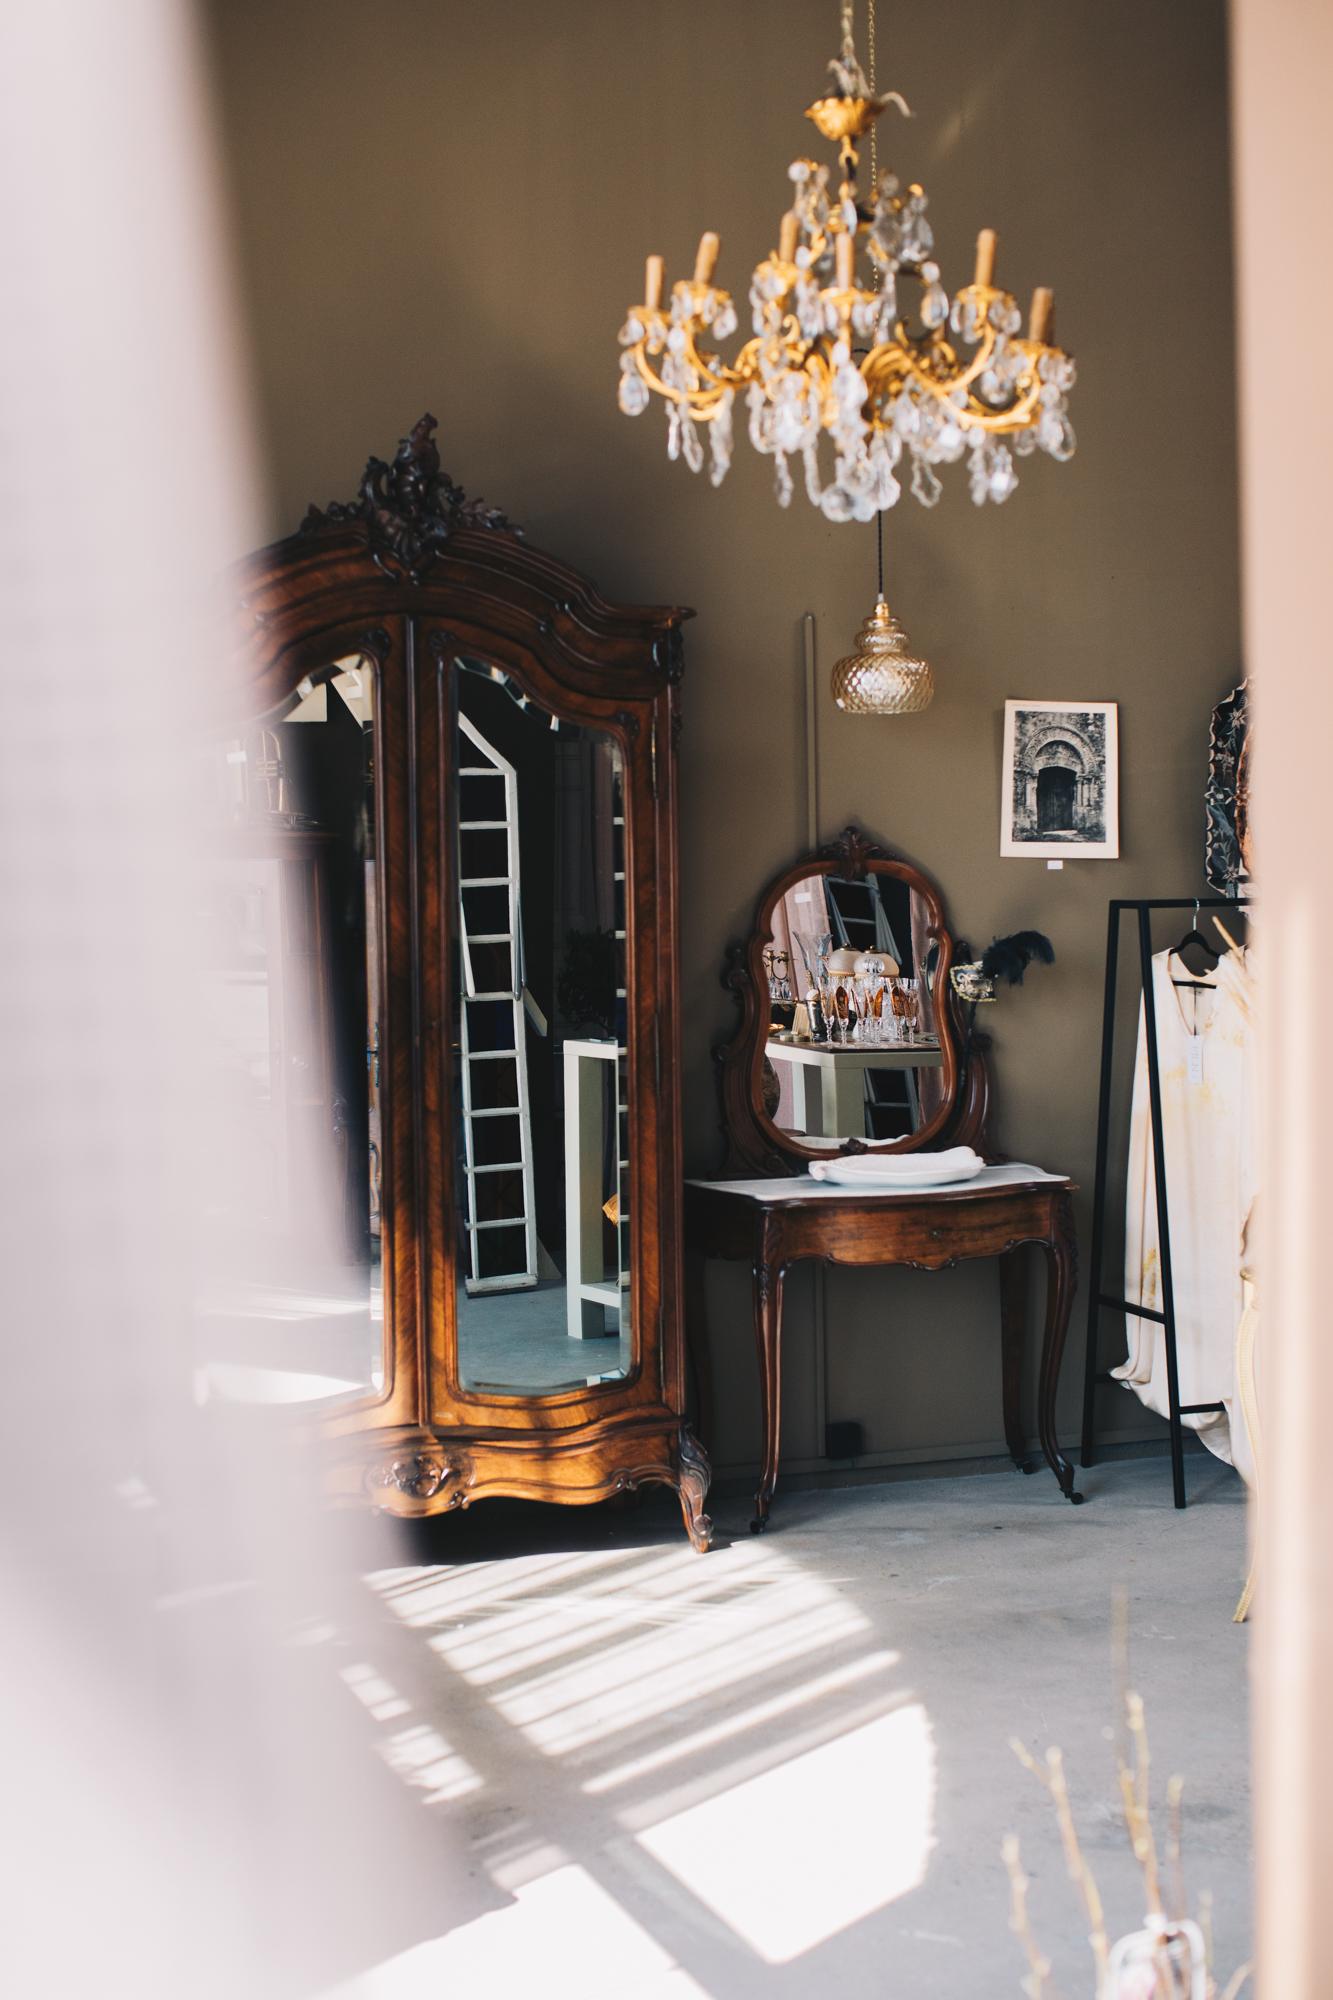 Artispelisse – återbruk av gamla franska skatter